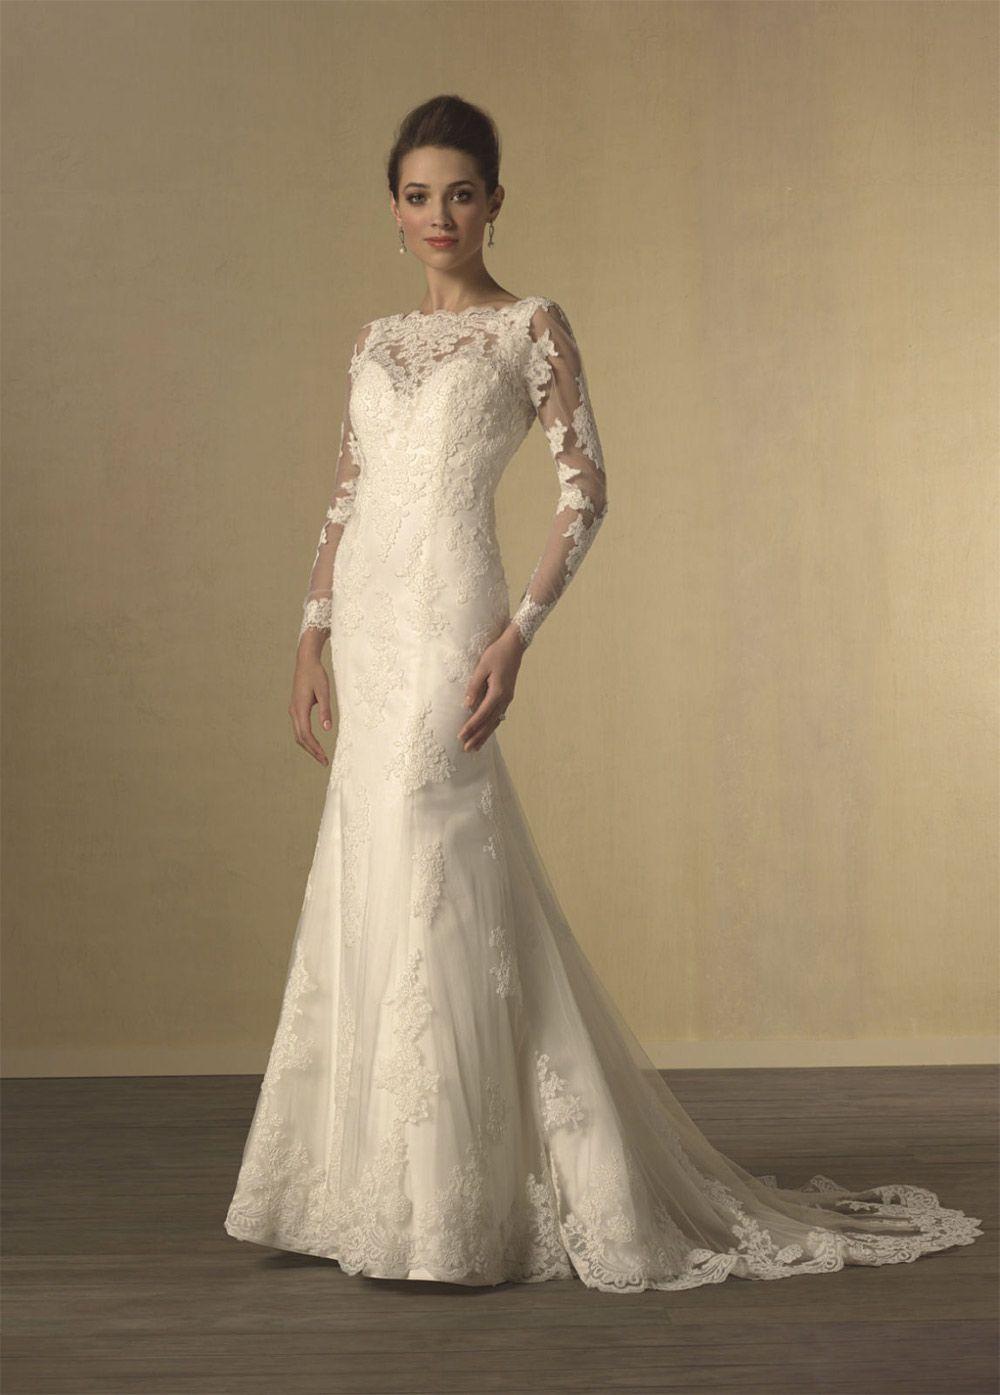 Twilight Wedding Dress – Get the Look | Twilight wedding dresses ...